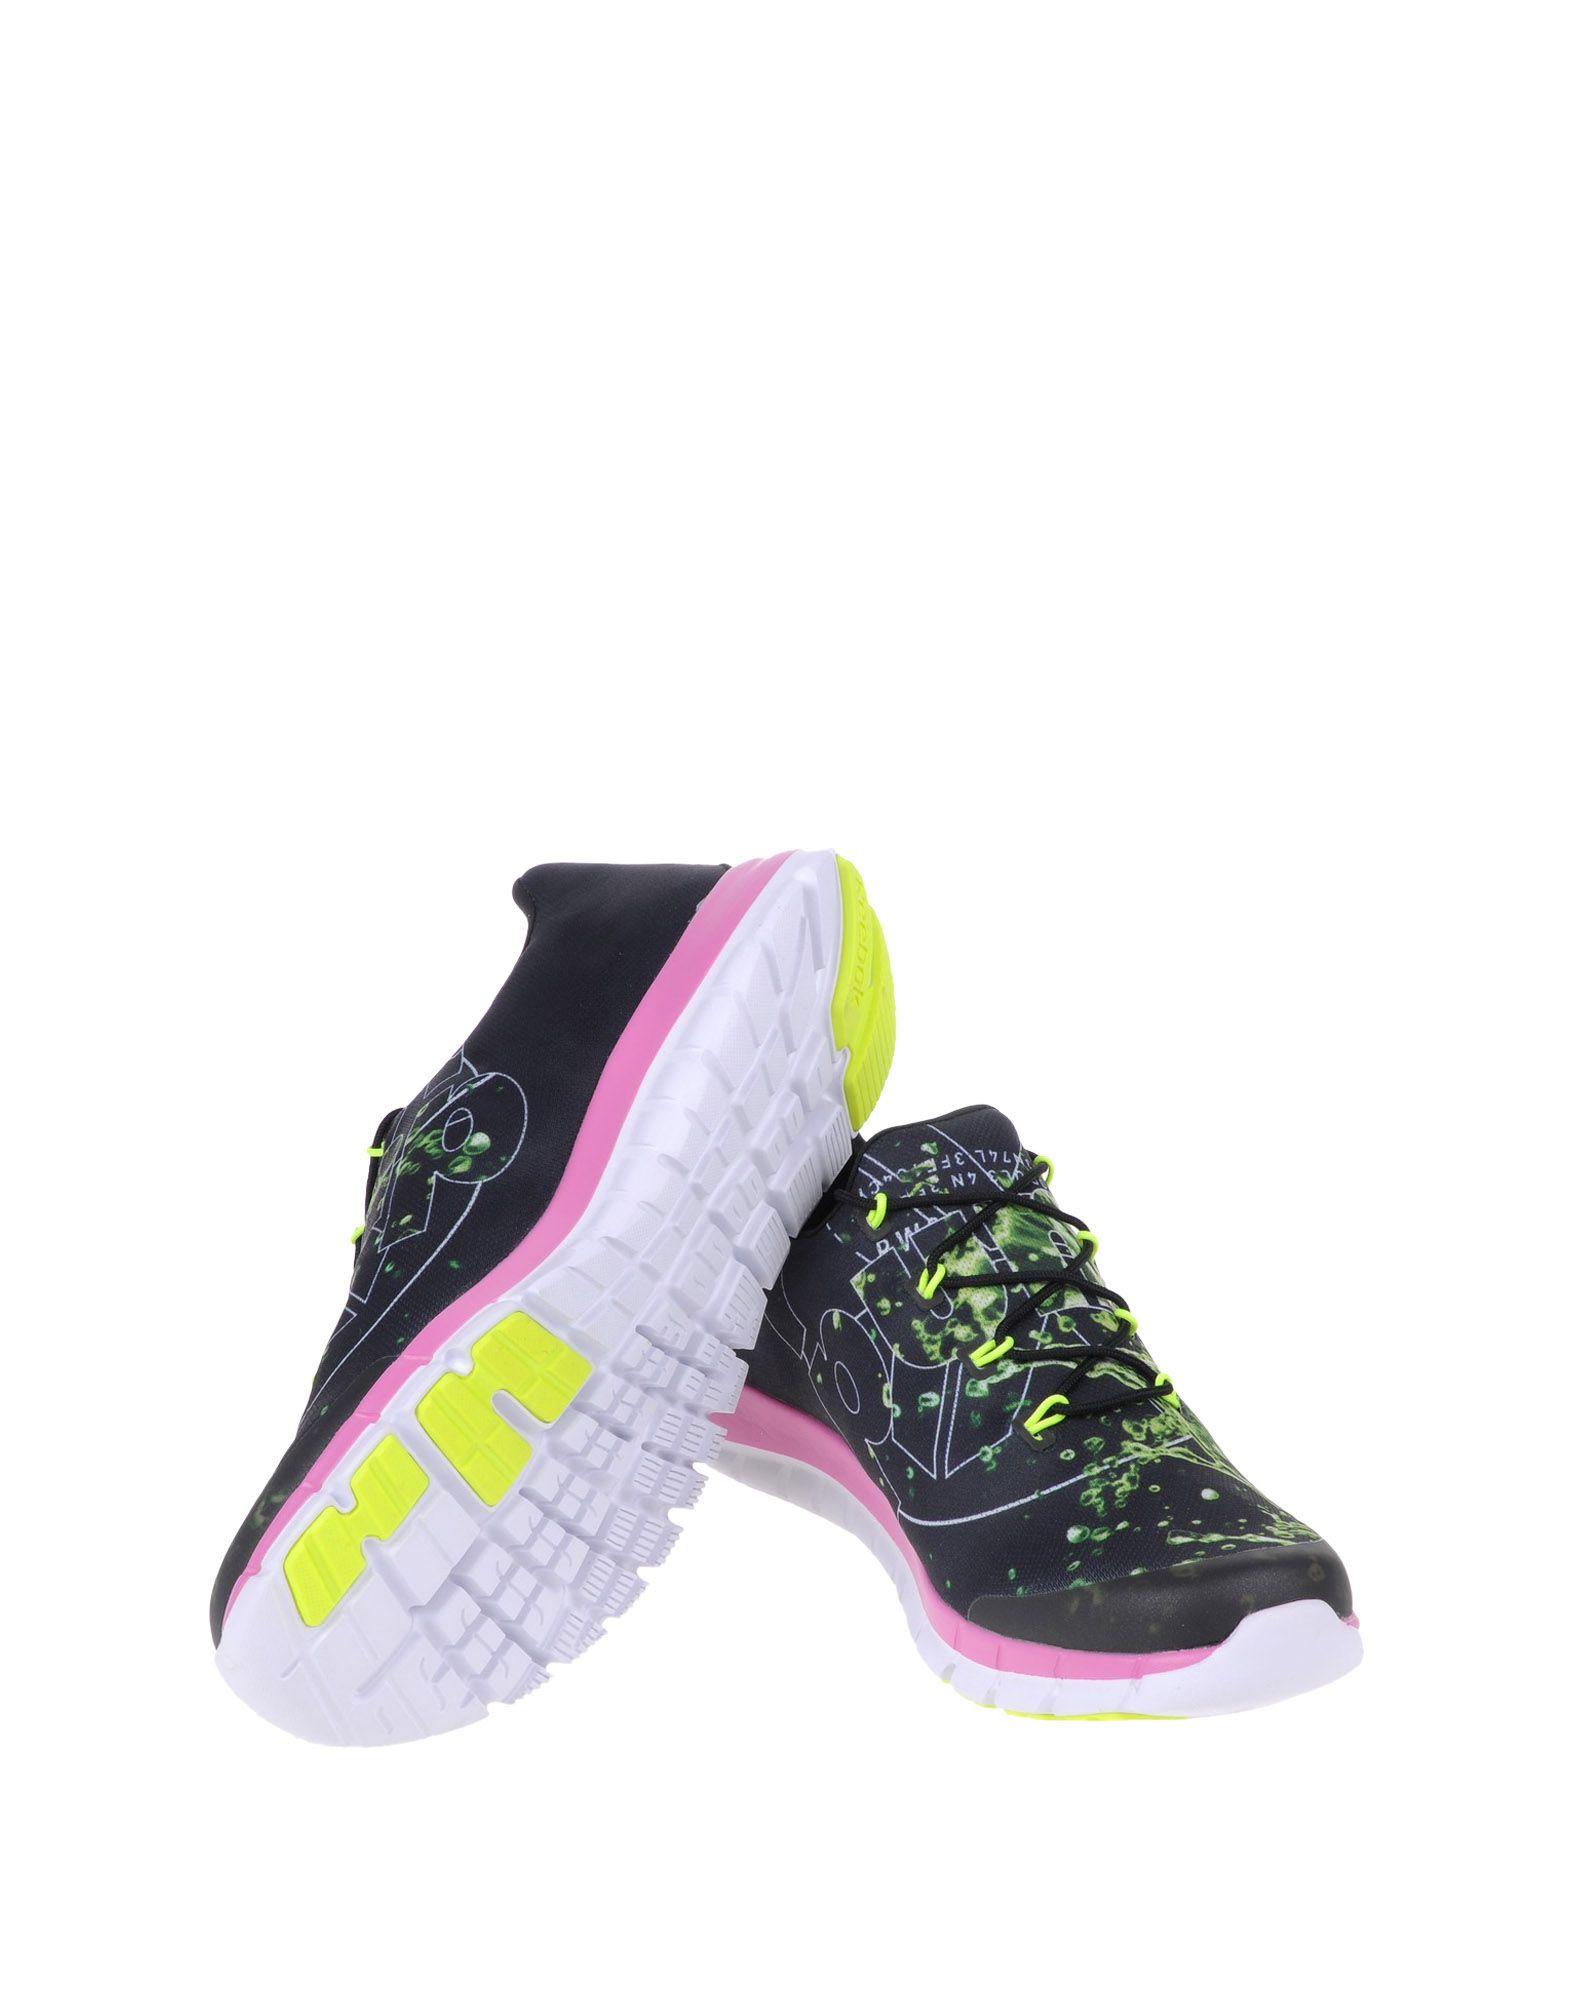 Sneakers Reebok Zpump Fusion Splash - Homme - Sneakers Reebok sur